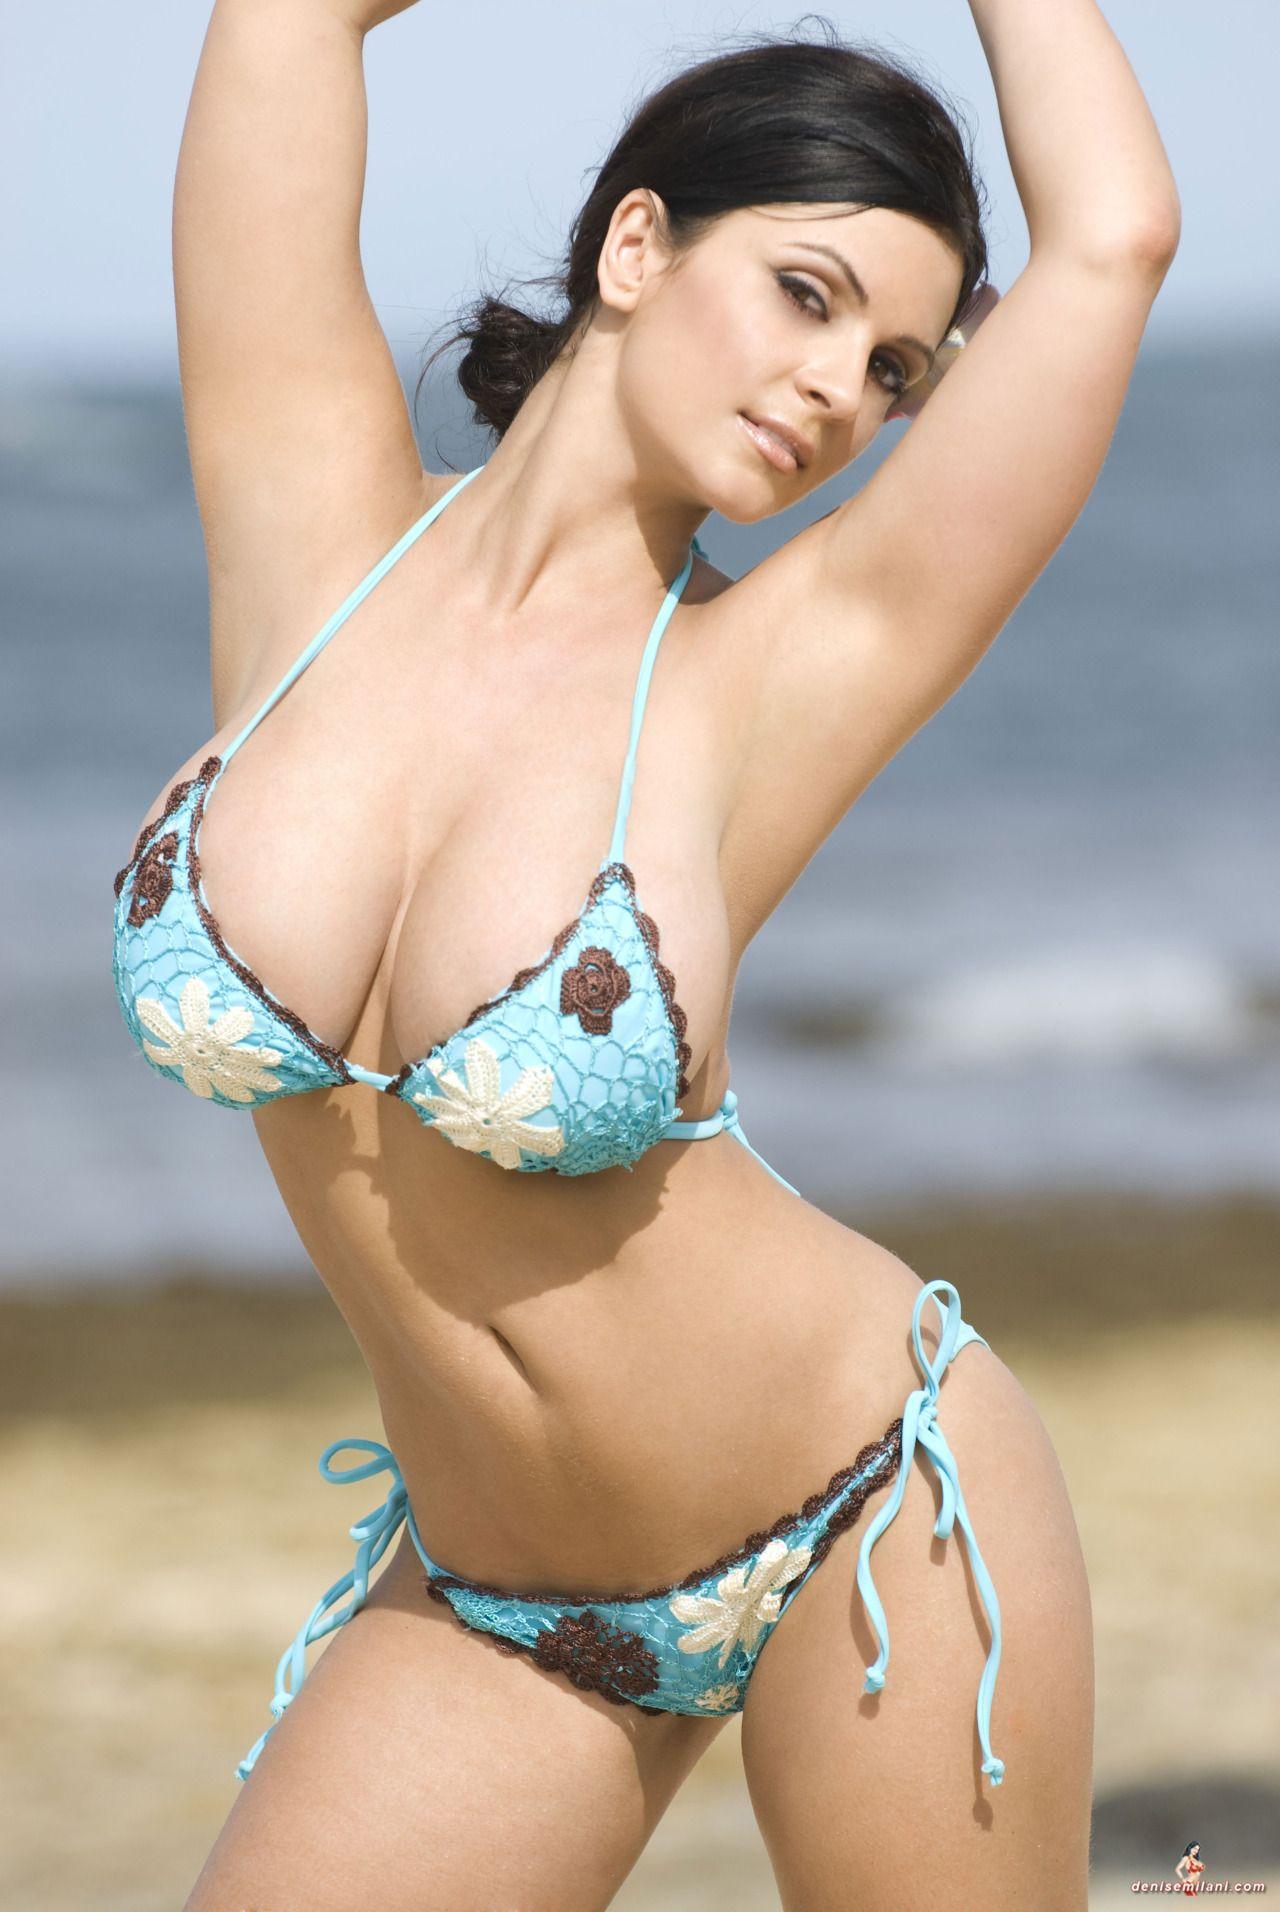 moda-bikini-i-chulkah-video-porno-trahnul-pyanogo-druga